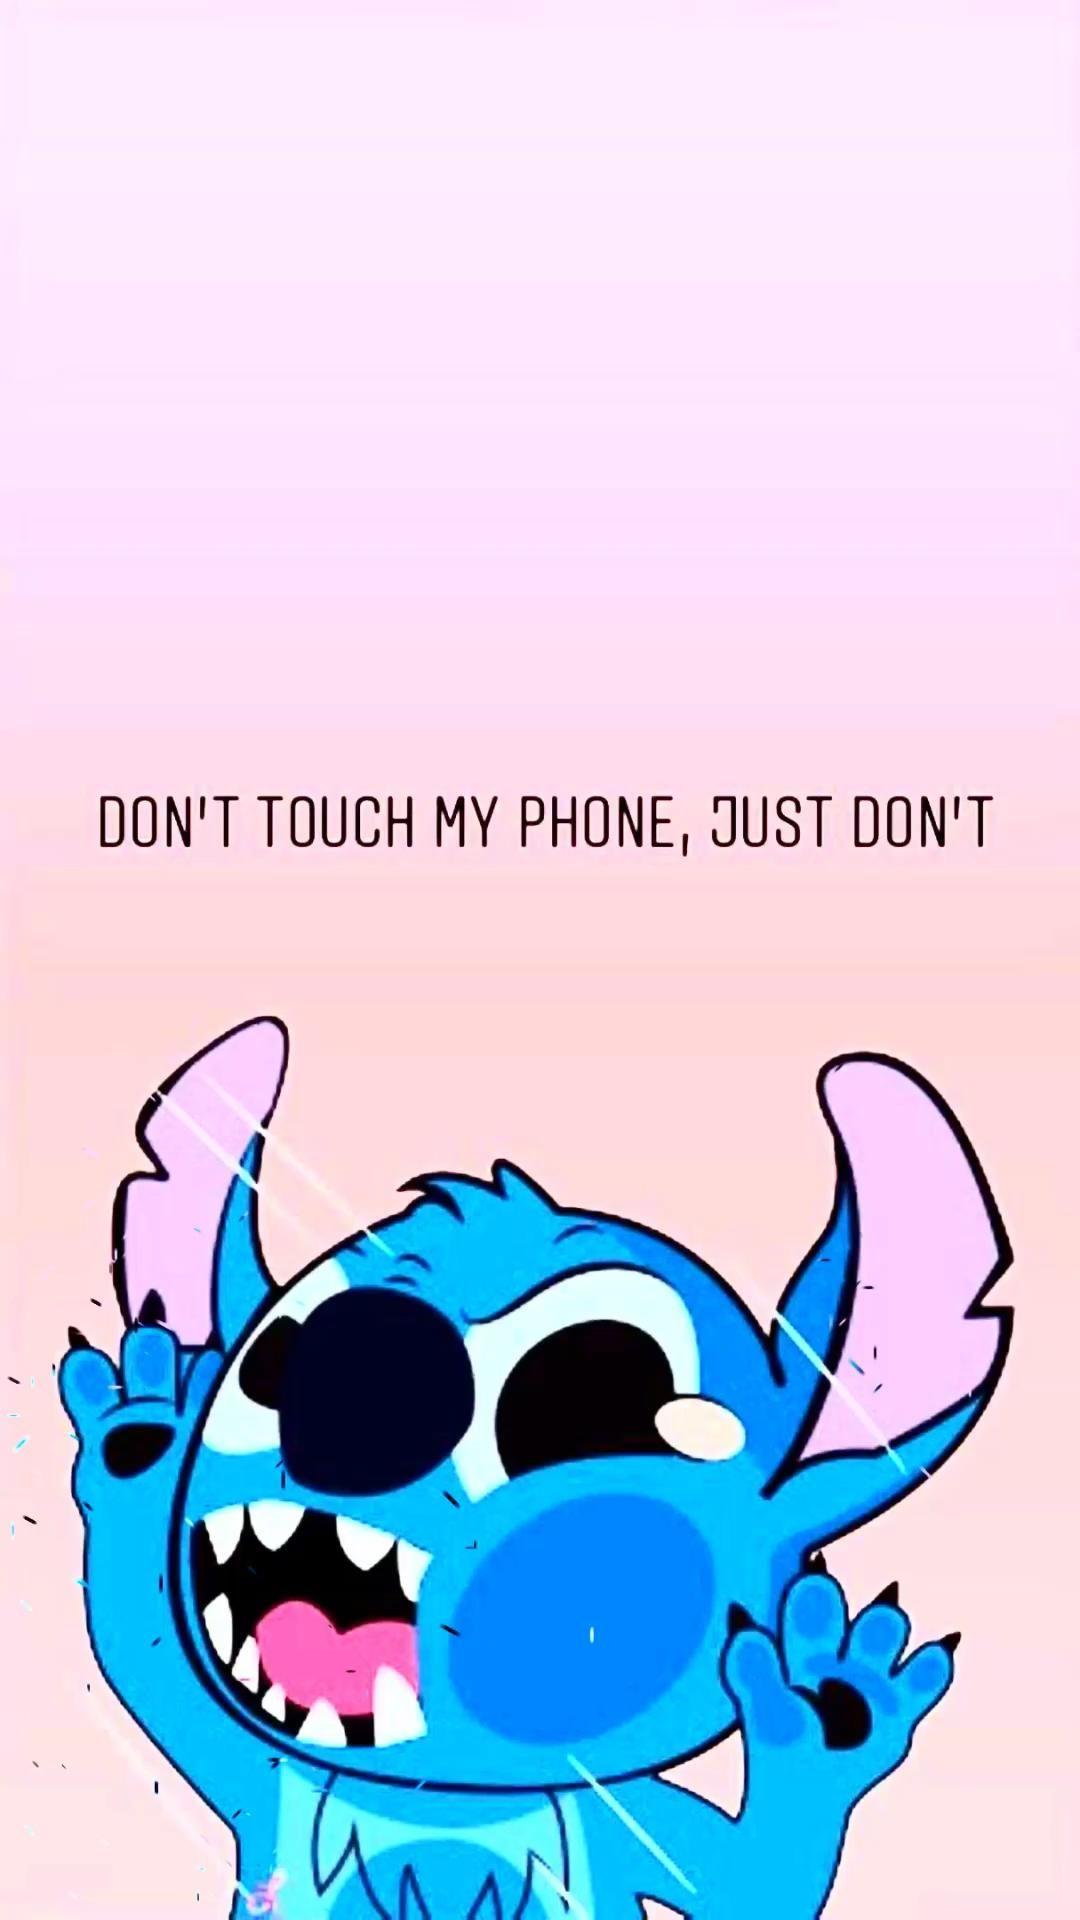 Pin By Carolyne On 2020 Digital Art Video Cartoon Wallpaper Iphone Disney Characters Wallpaper Funny Phone Wallpaper